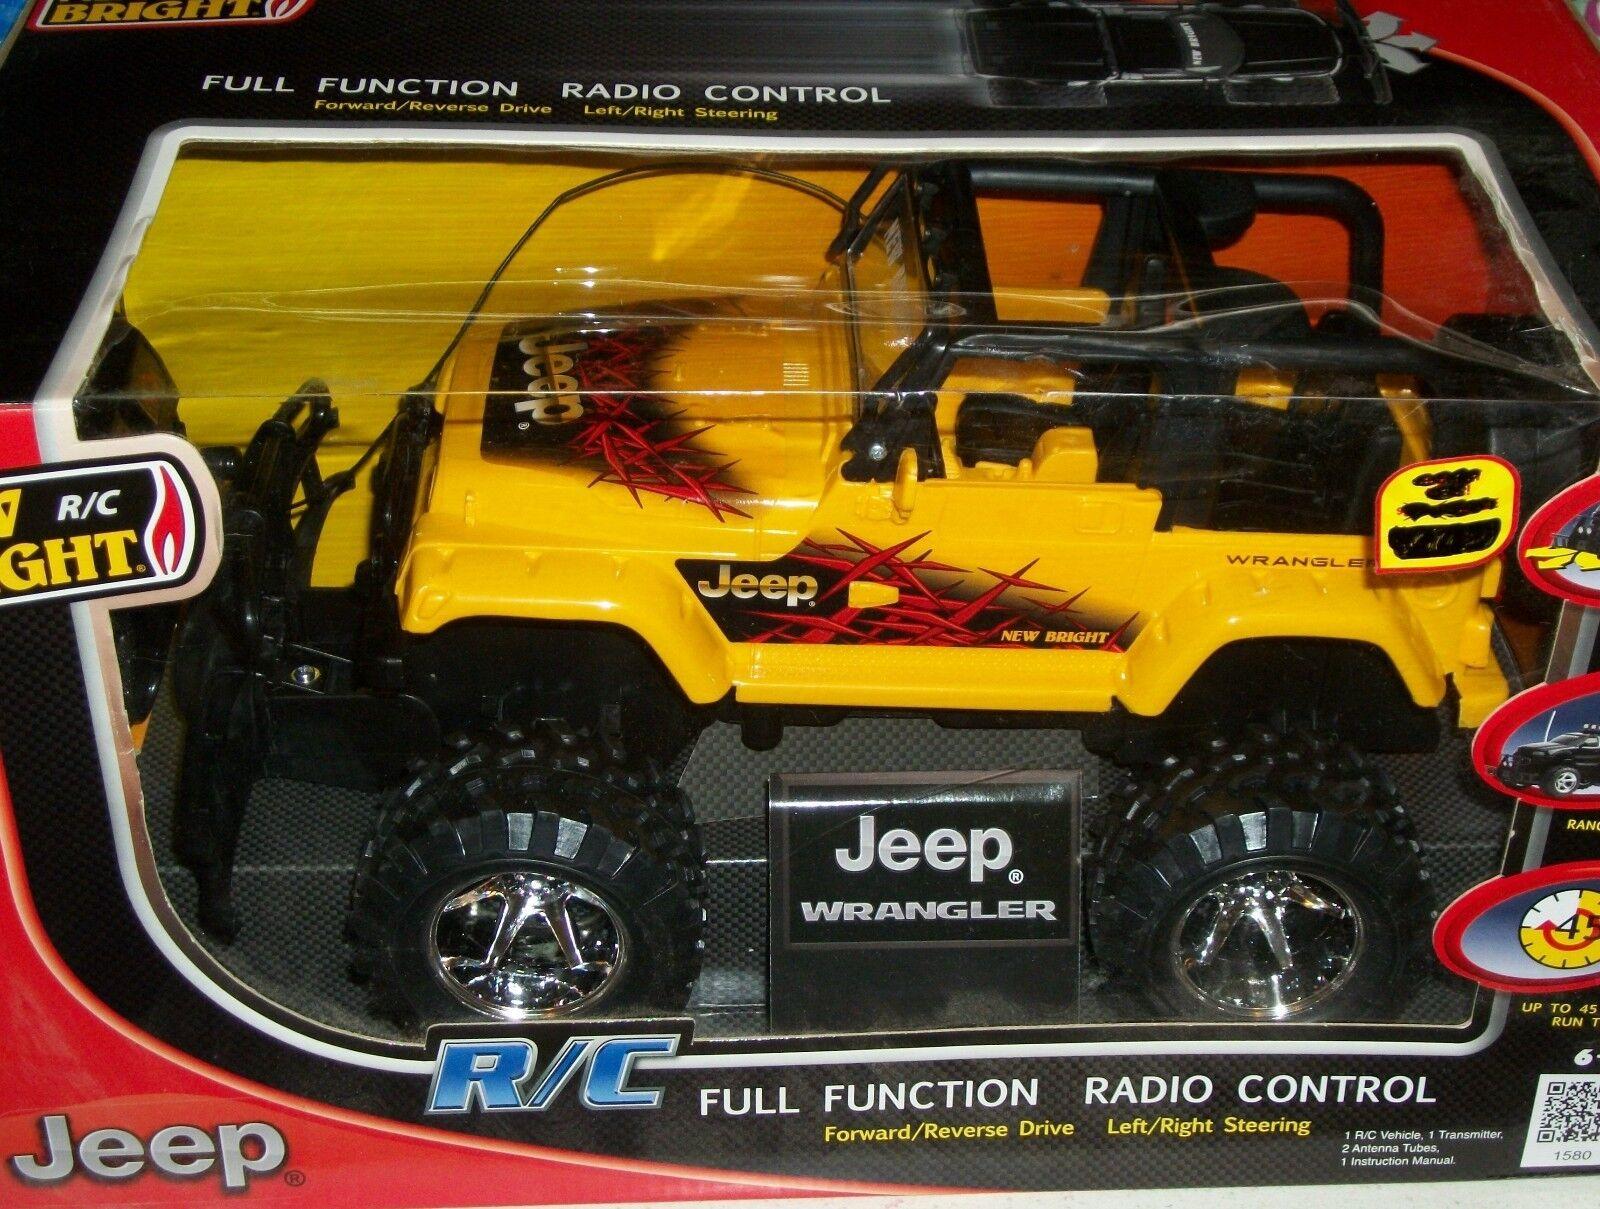 Jeep Wrangle R C Full Function Radio Control car Remote Remote Remote toy car Xmas vehicle toy bdb007